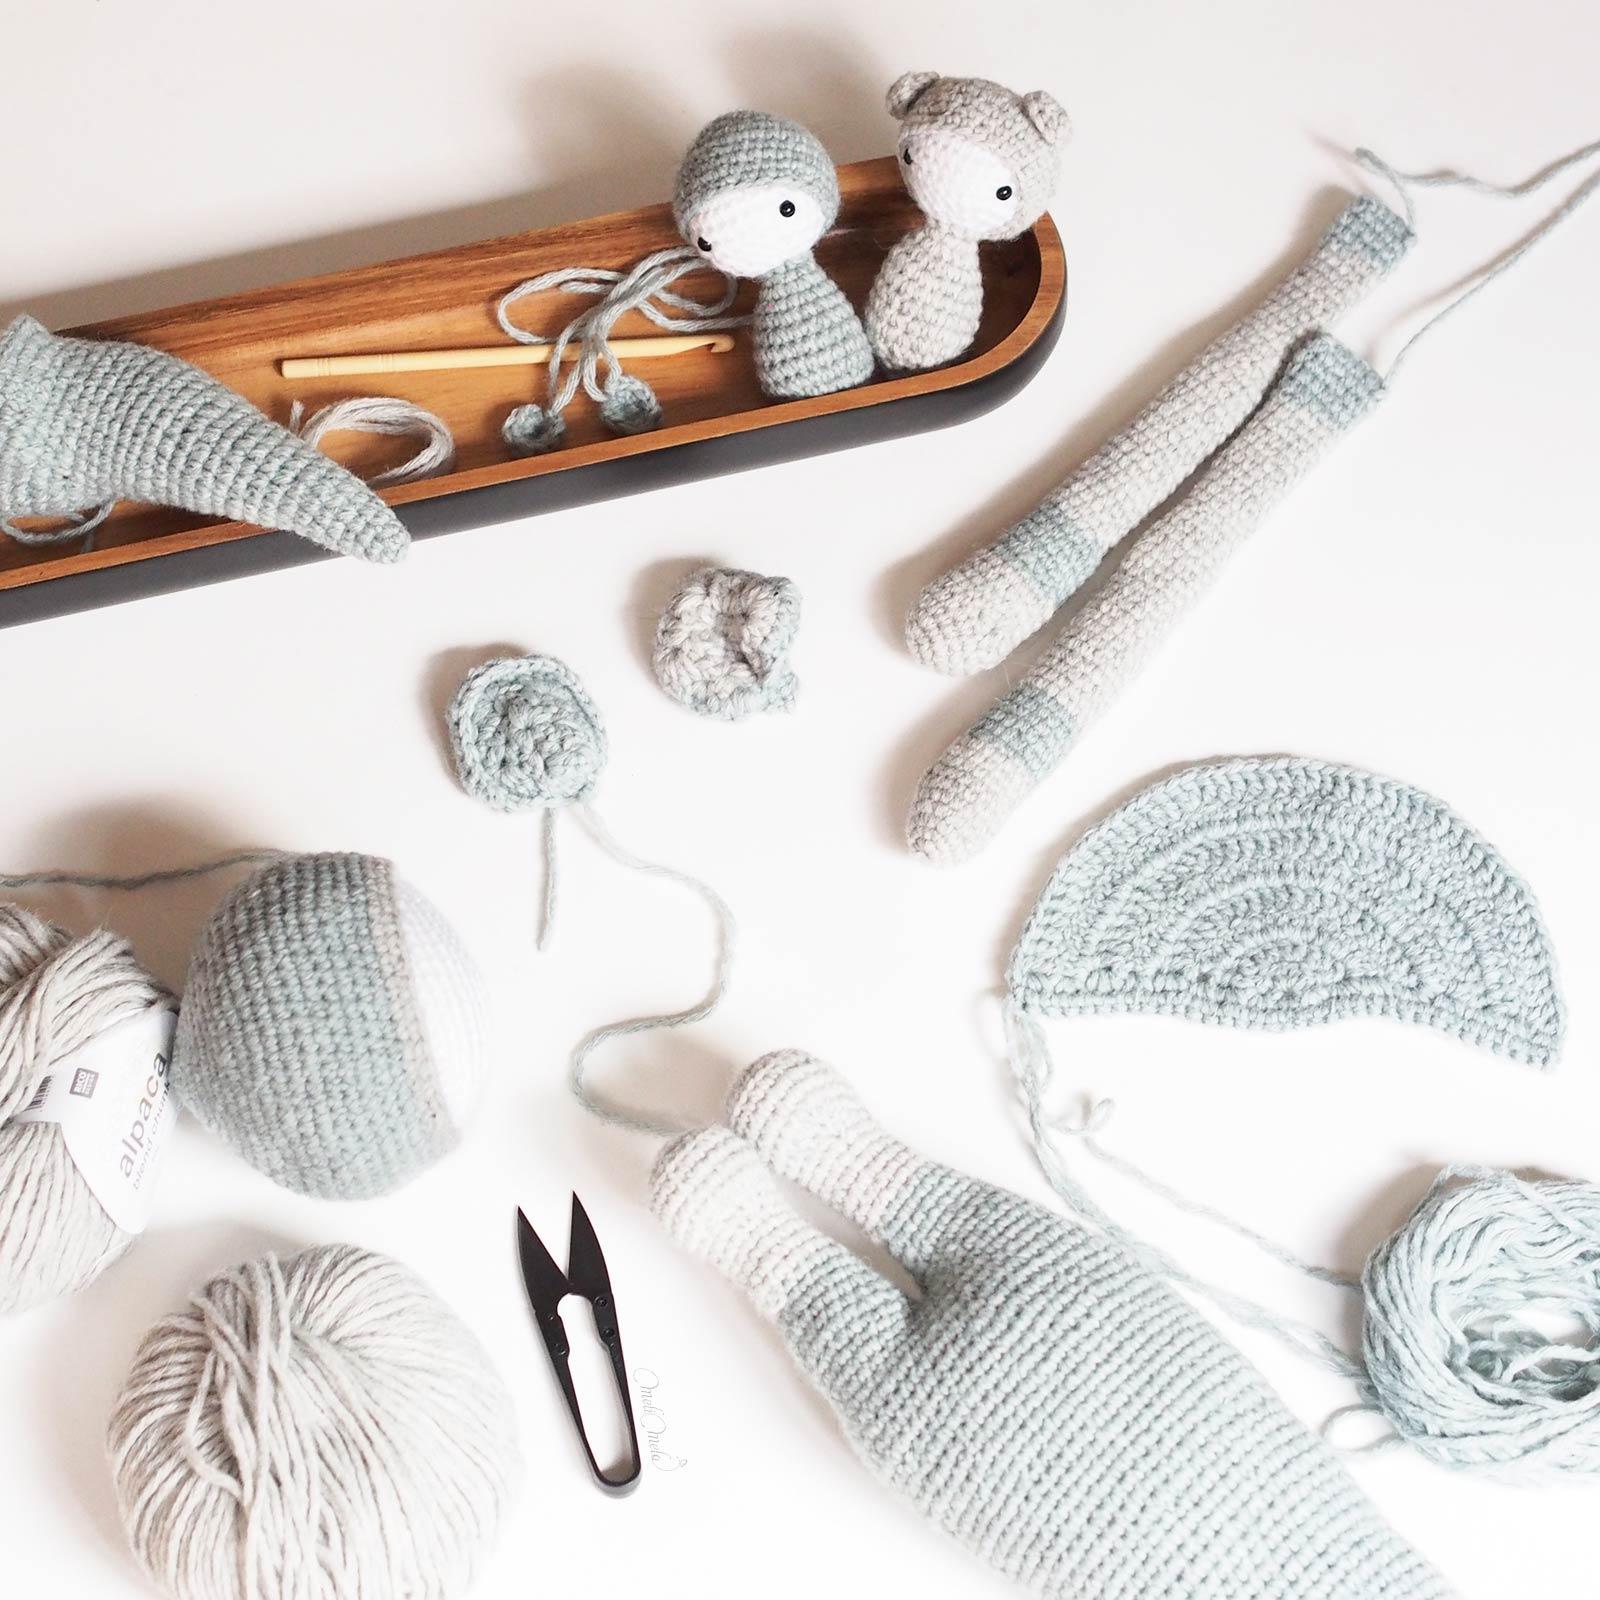 crochet kangourou Kira corps encours Lalylala alpaca ricodesign laboutiquedemelimelo